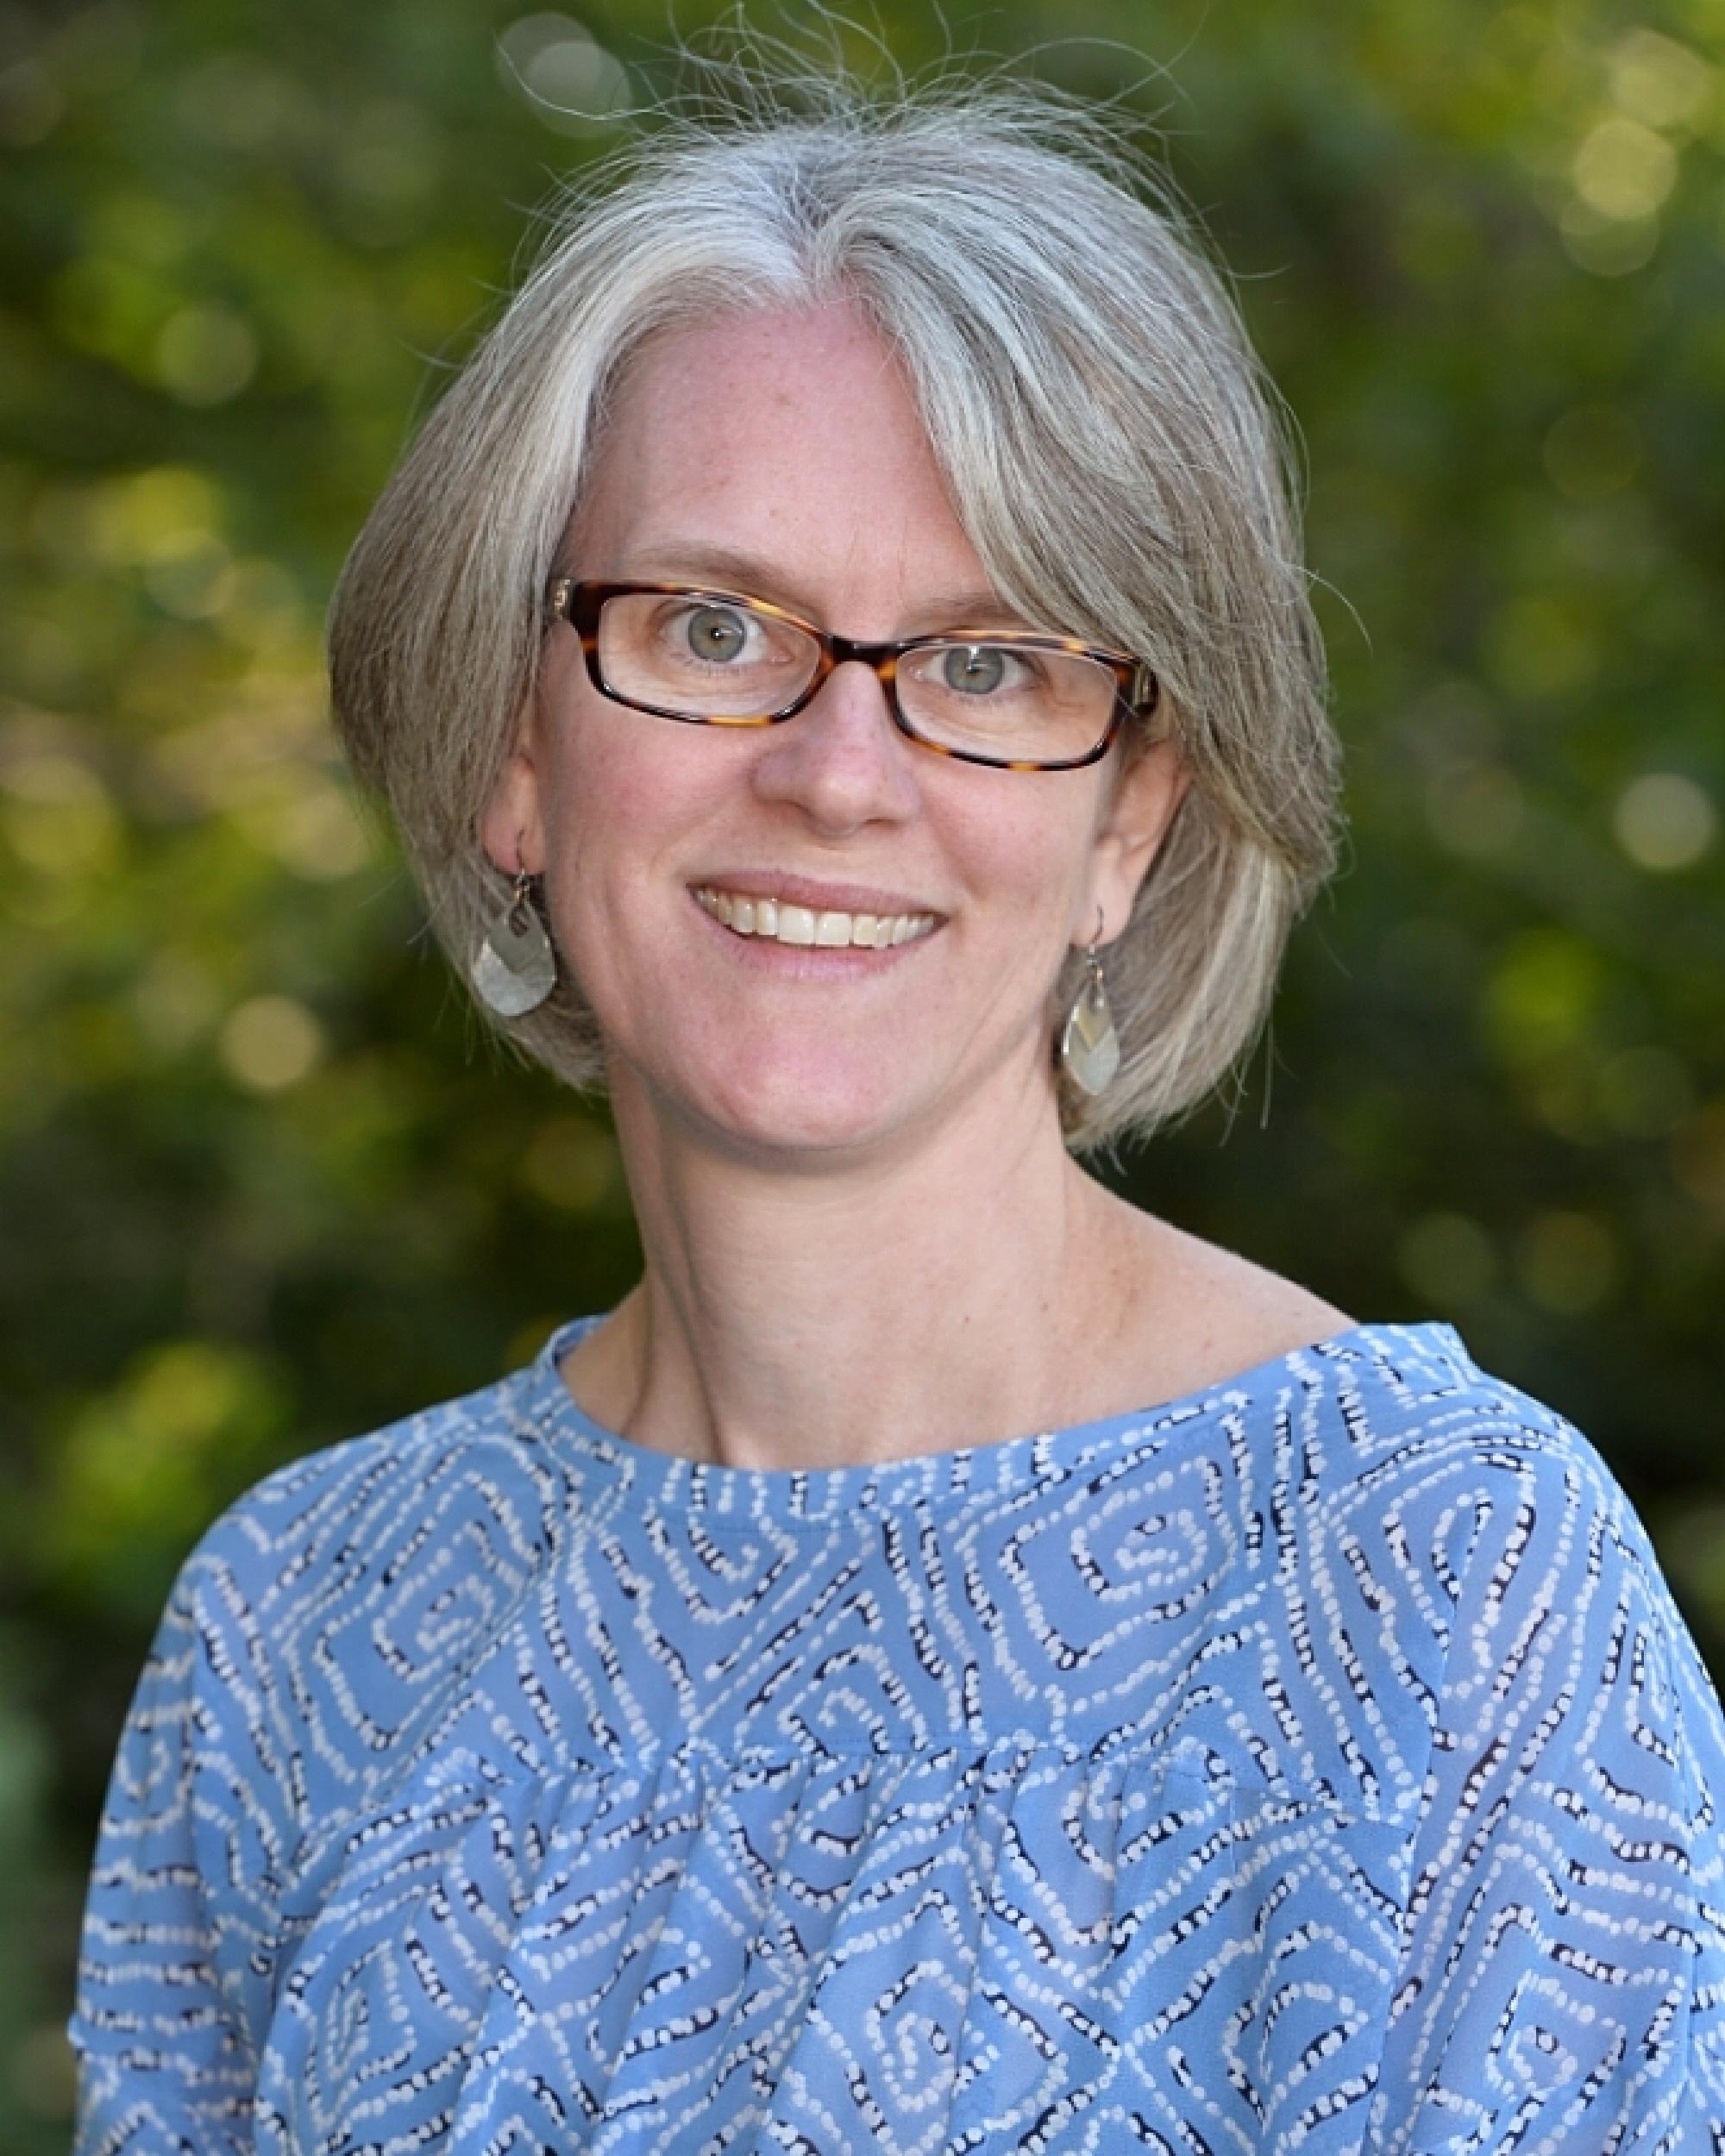 Beth Yavenditti: Director of Global Studies